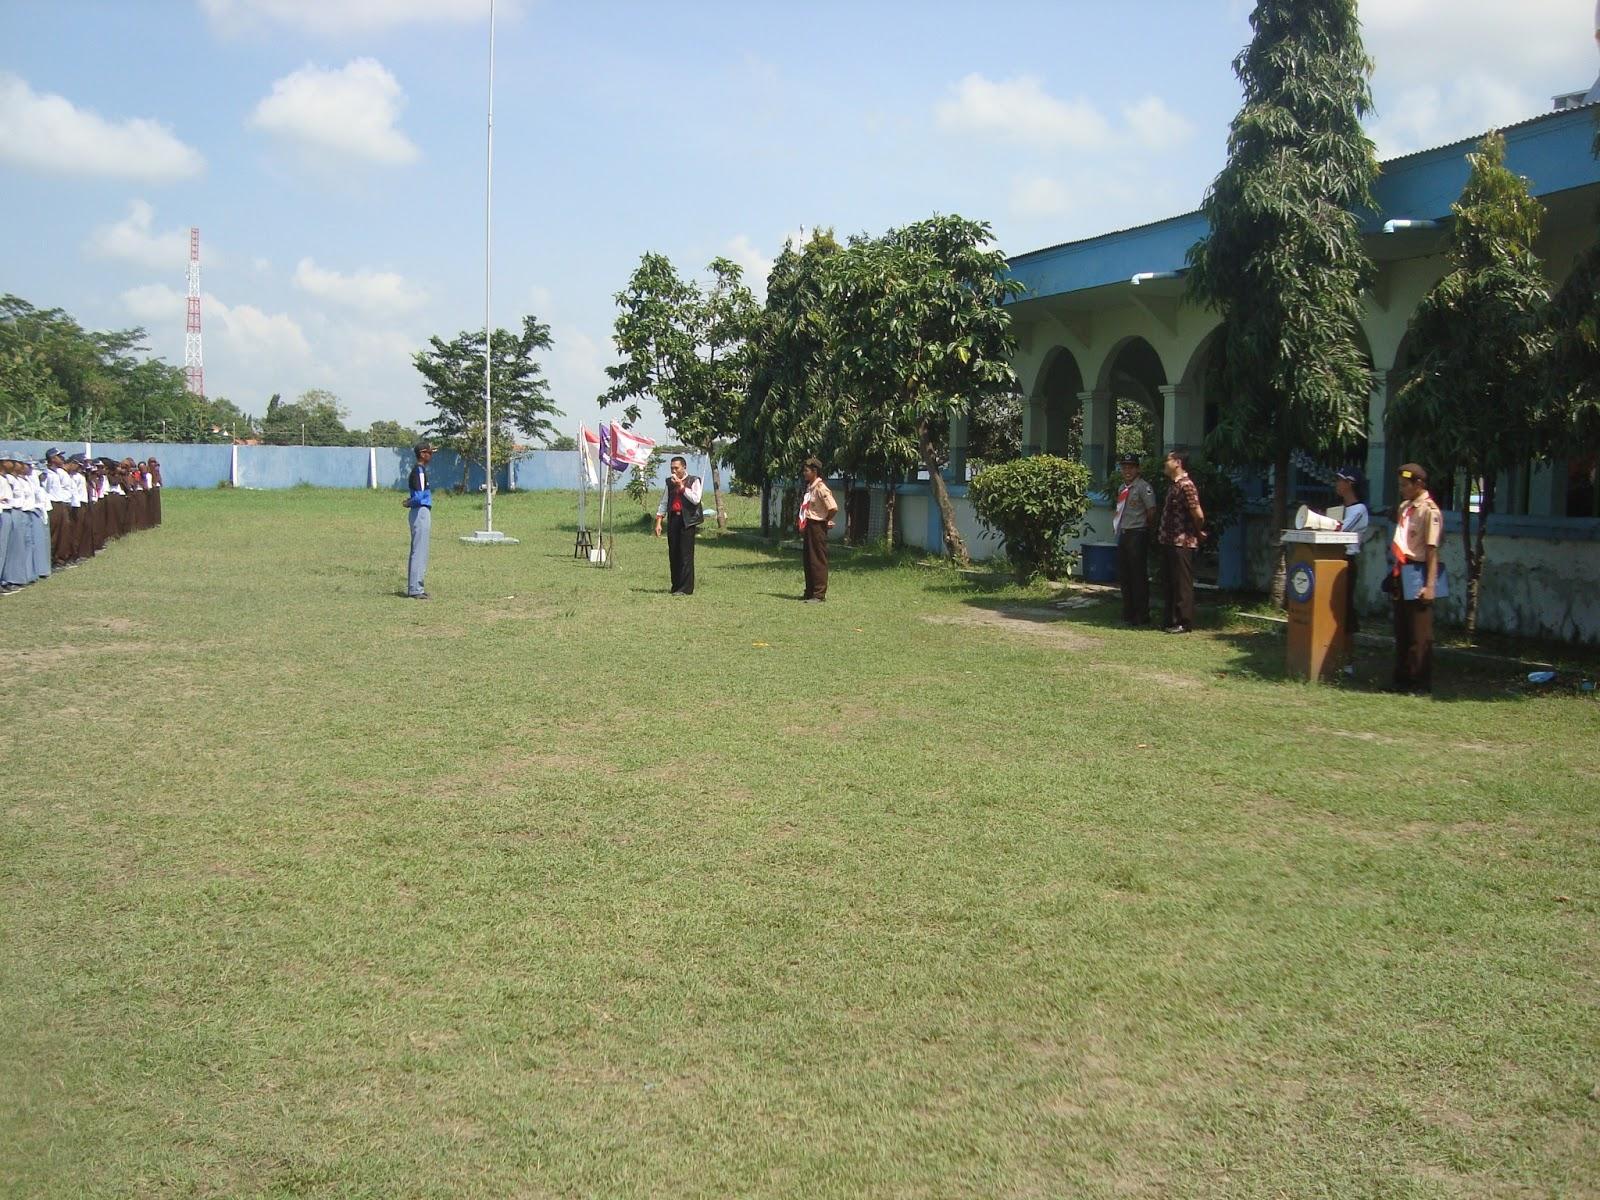 Latihan Gabungan bersama Pramuka dan PMR SMA Negeri 1 Pemalang